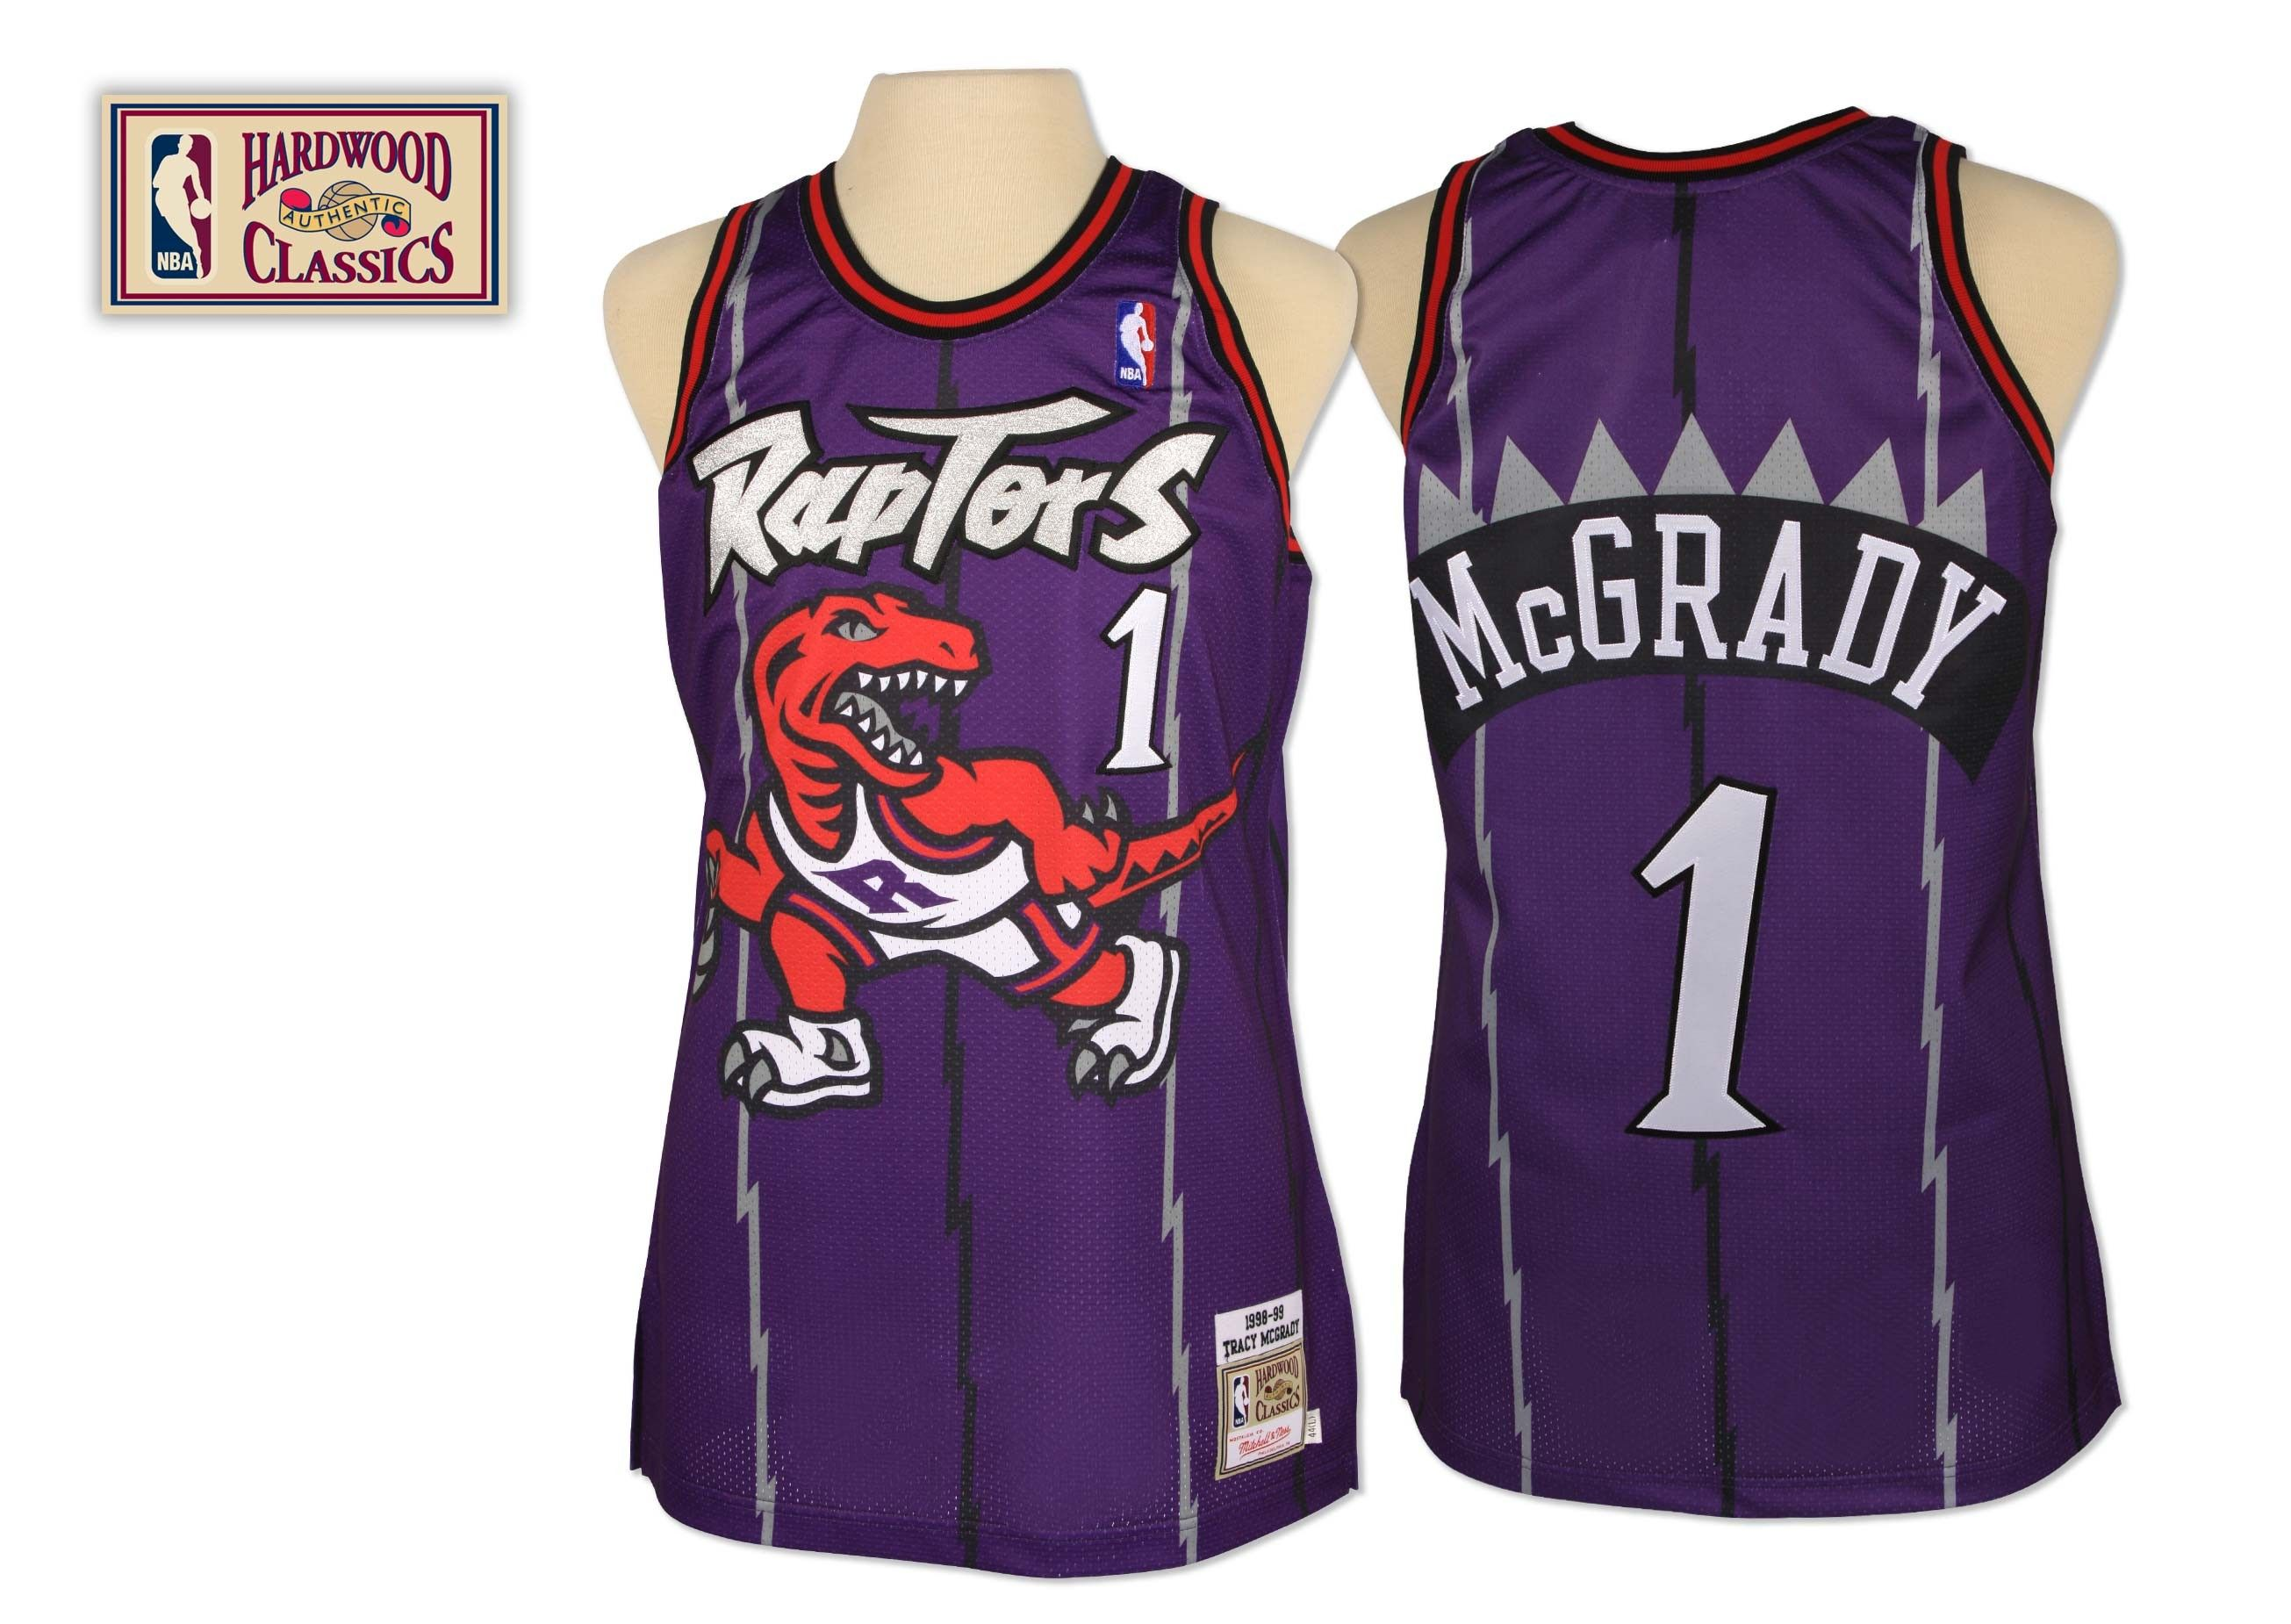 Tracy McGrady Authentic Jersey Toronto Raptors Mitchell & Ness Nostalgia Co.